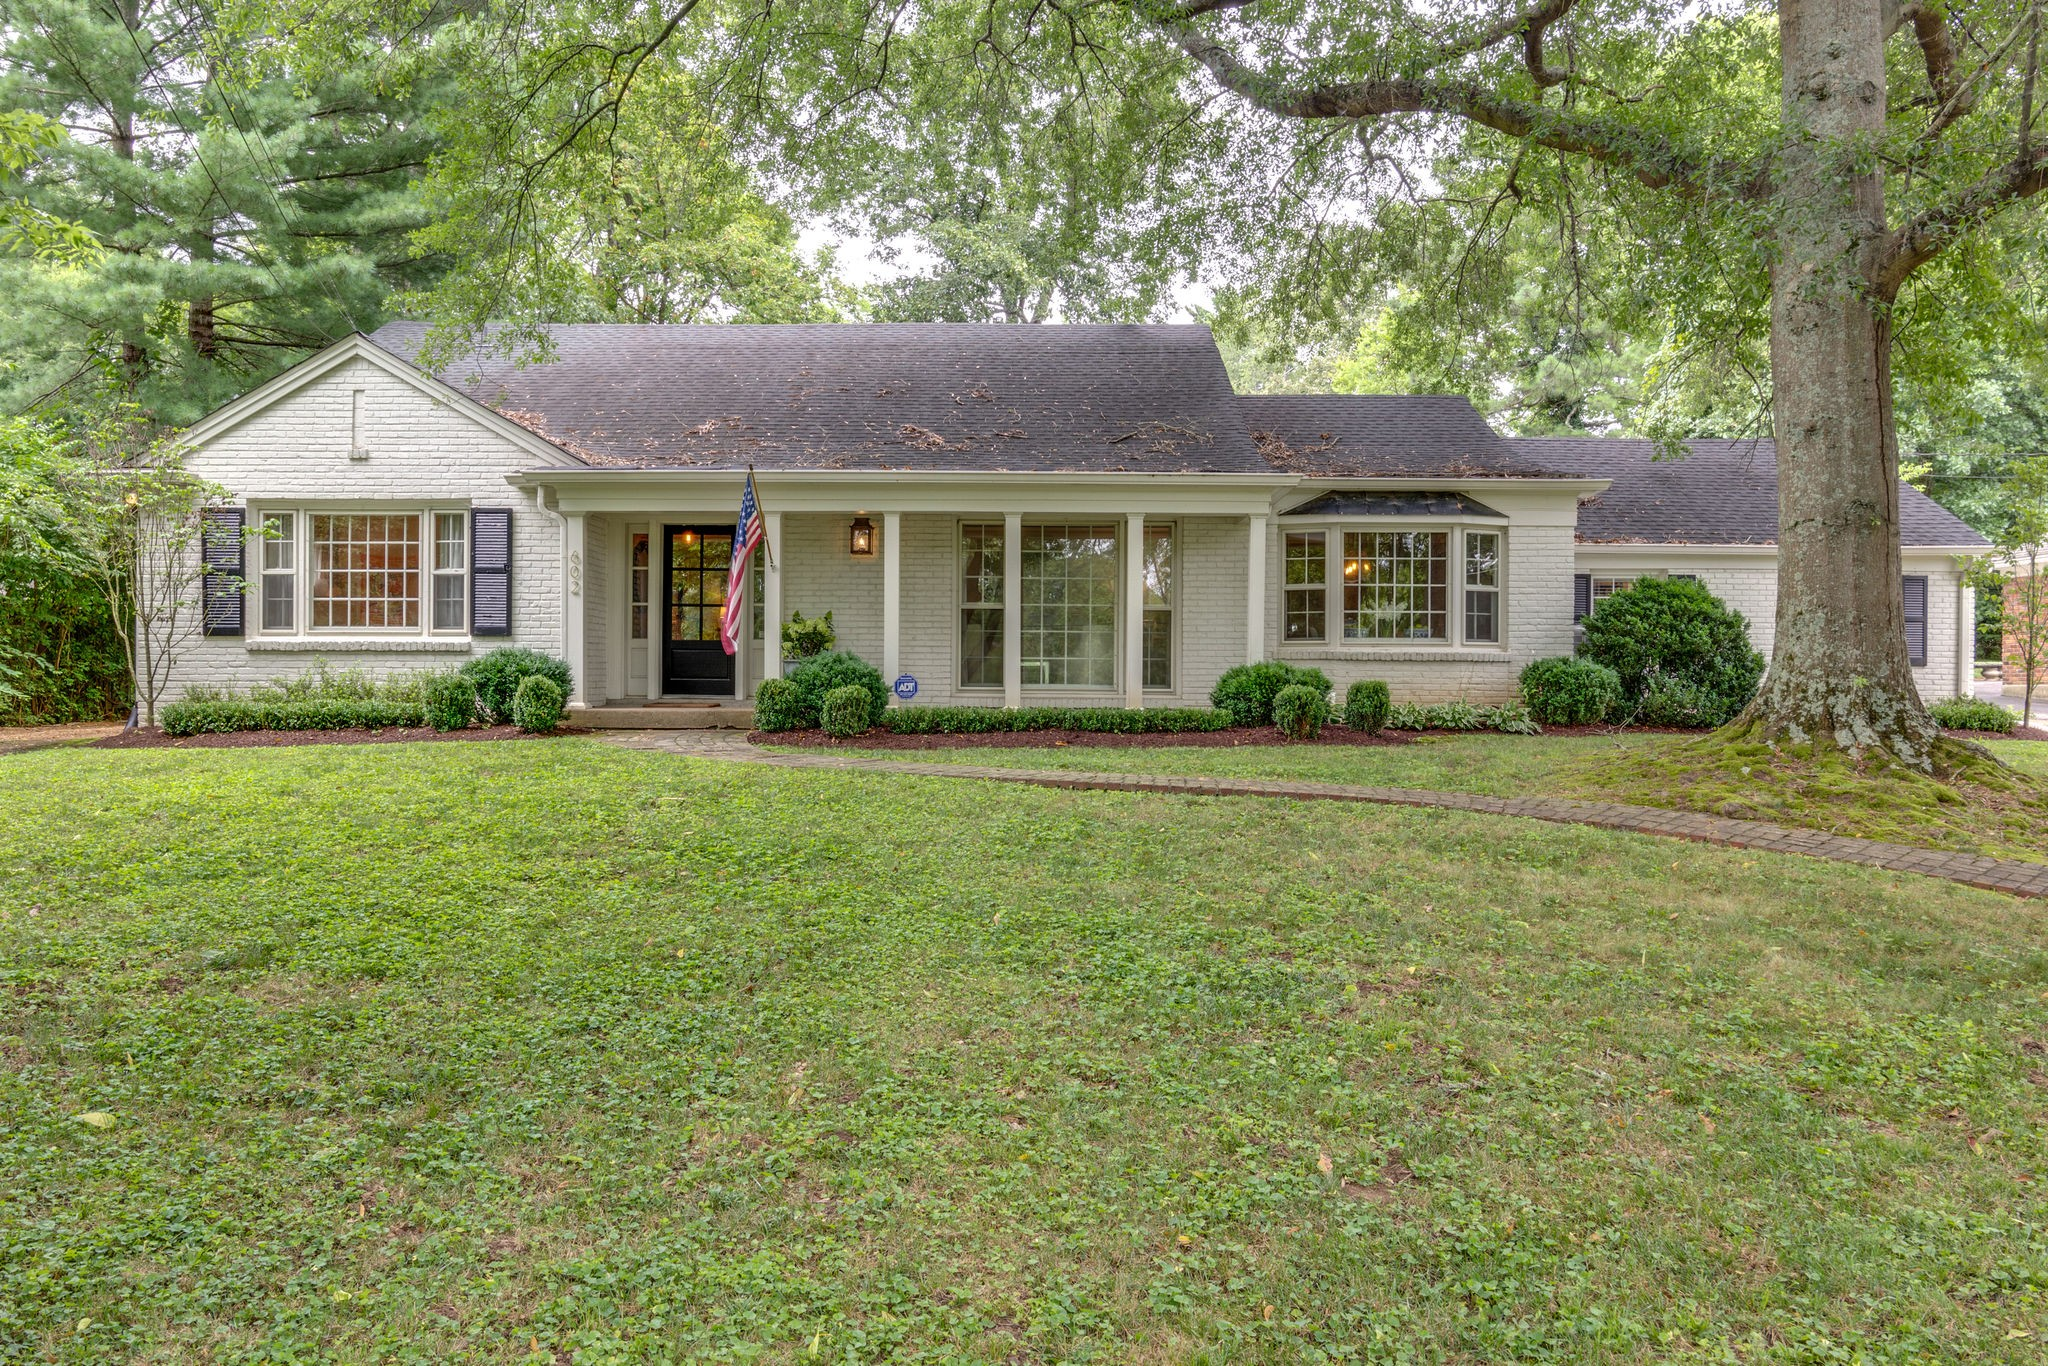 602 Estes Rd, Nashville, TN 37215 - Nashville, TN real estate listing